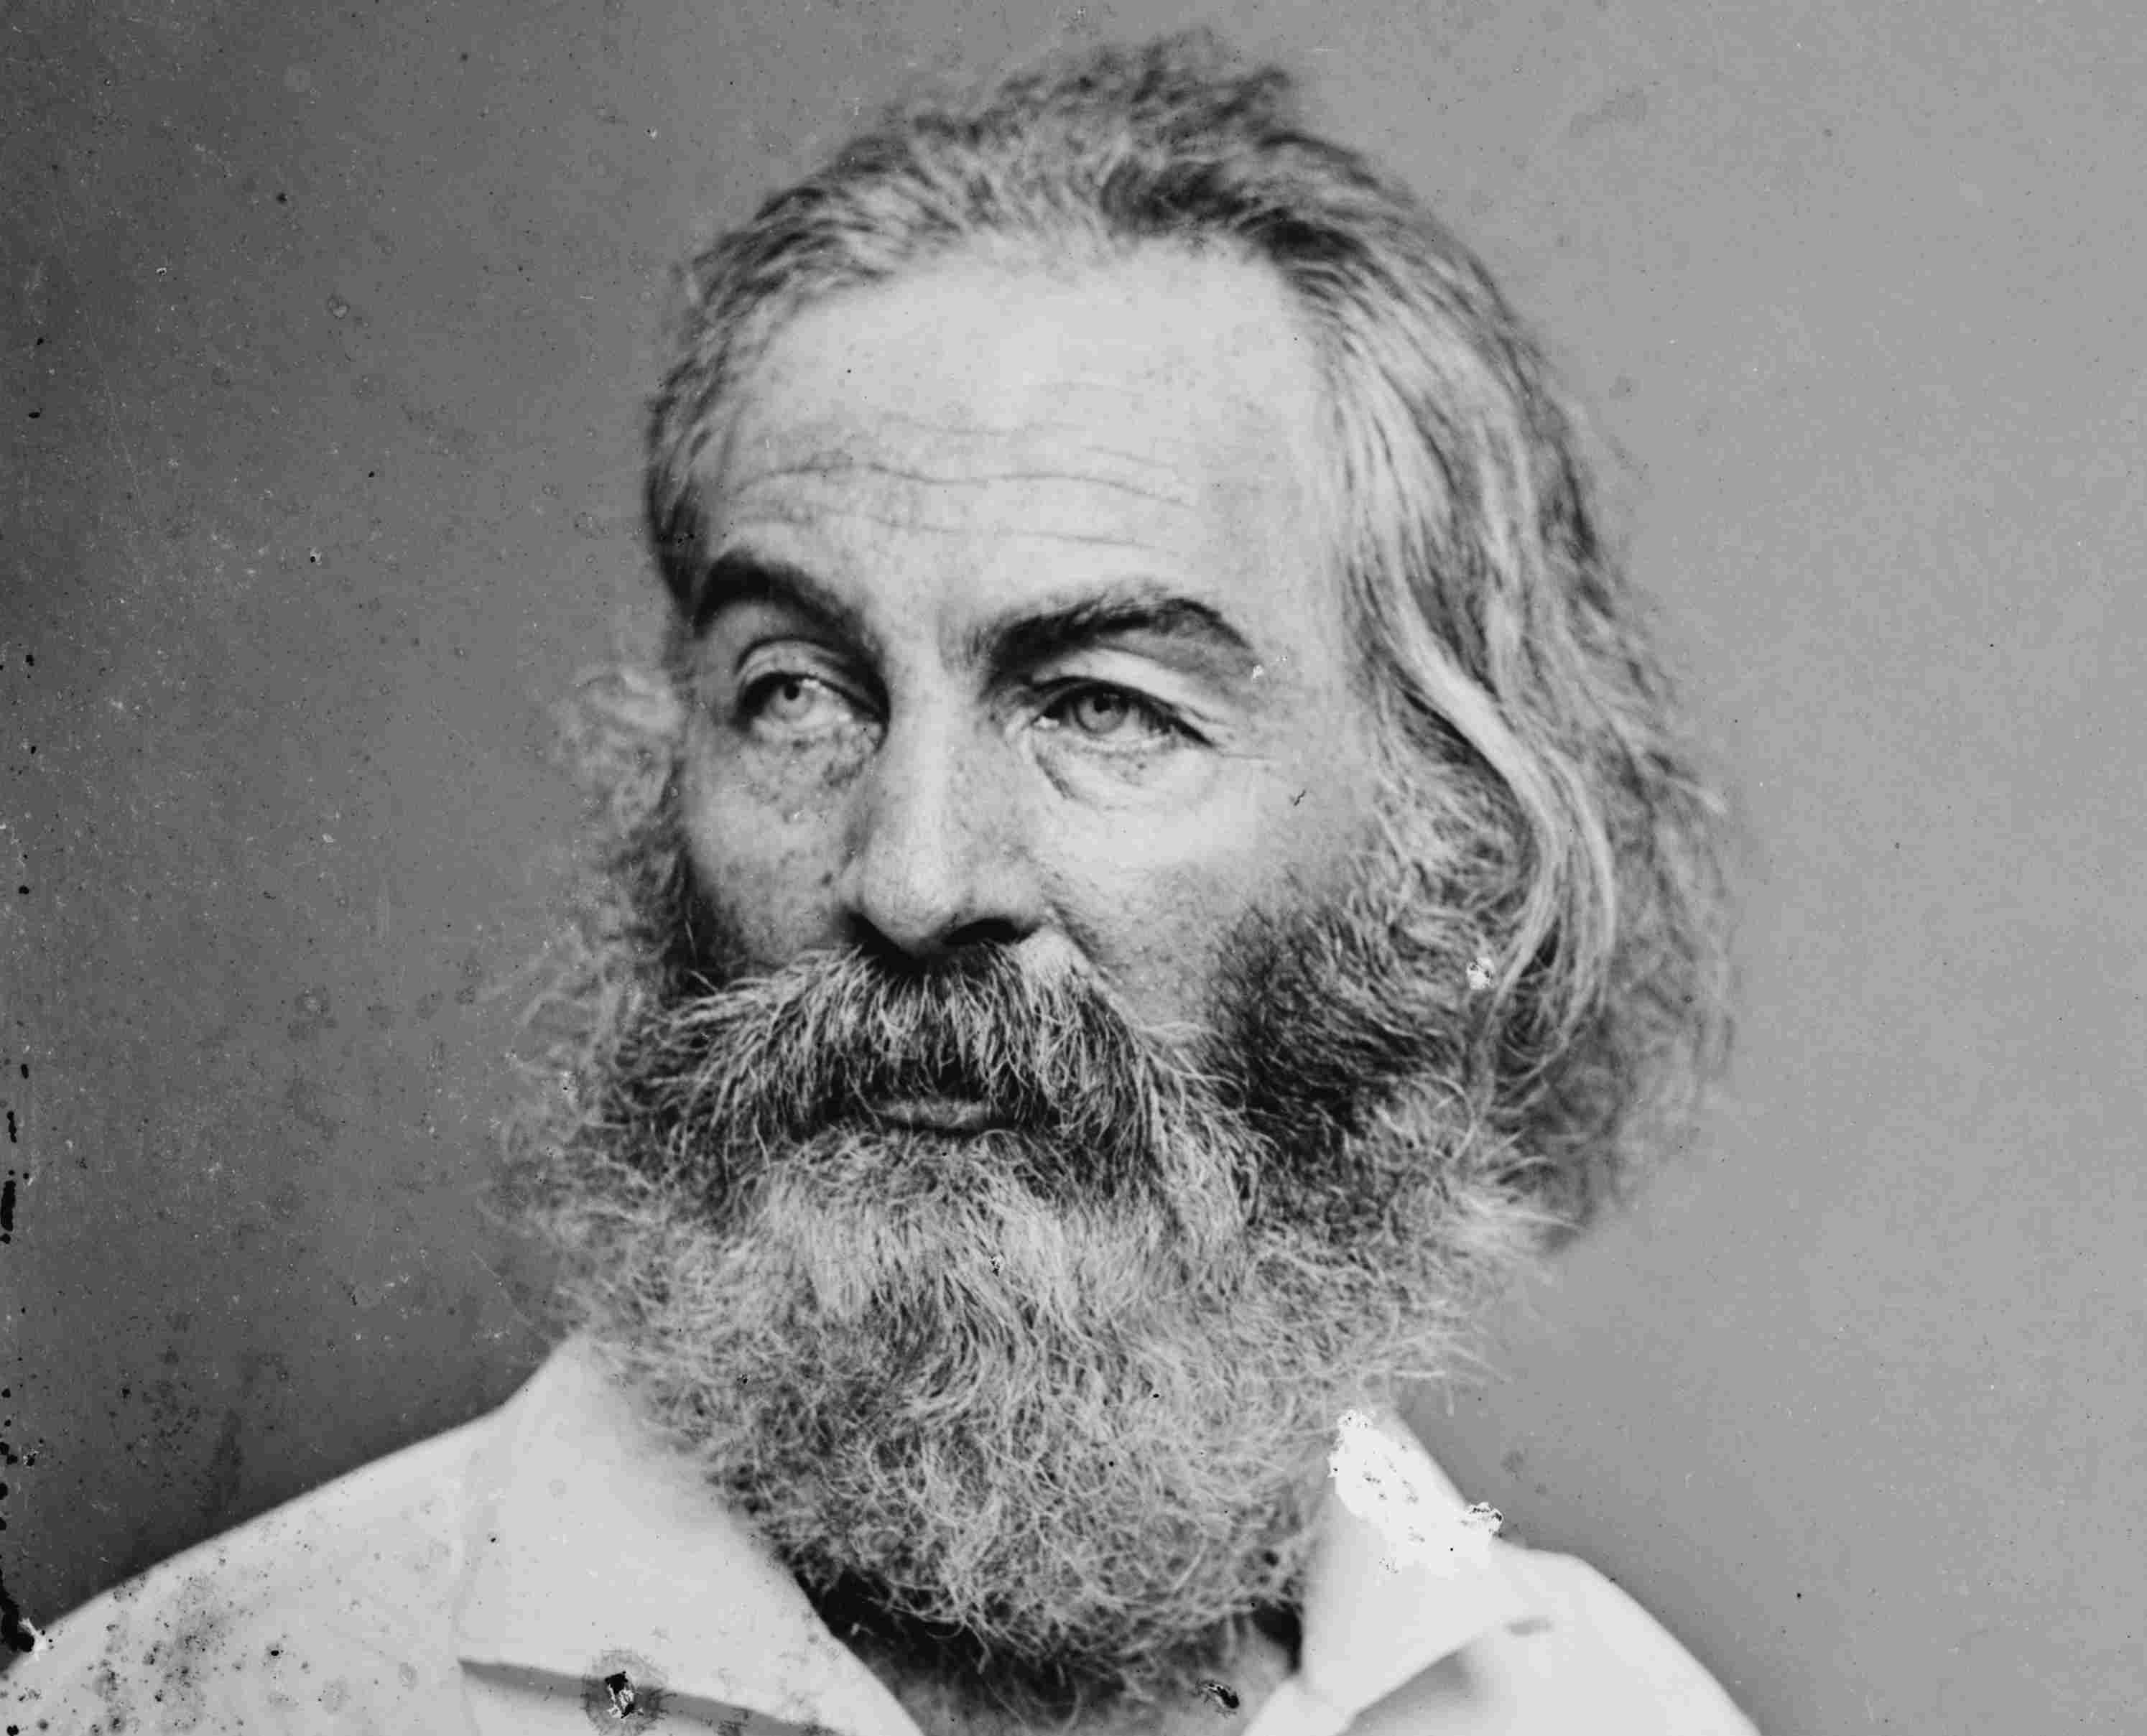 Civil War era photograph of Walt Whitman.